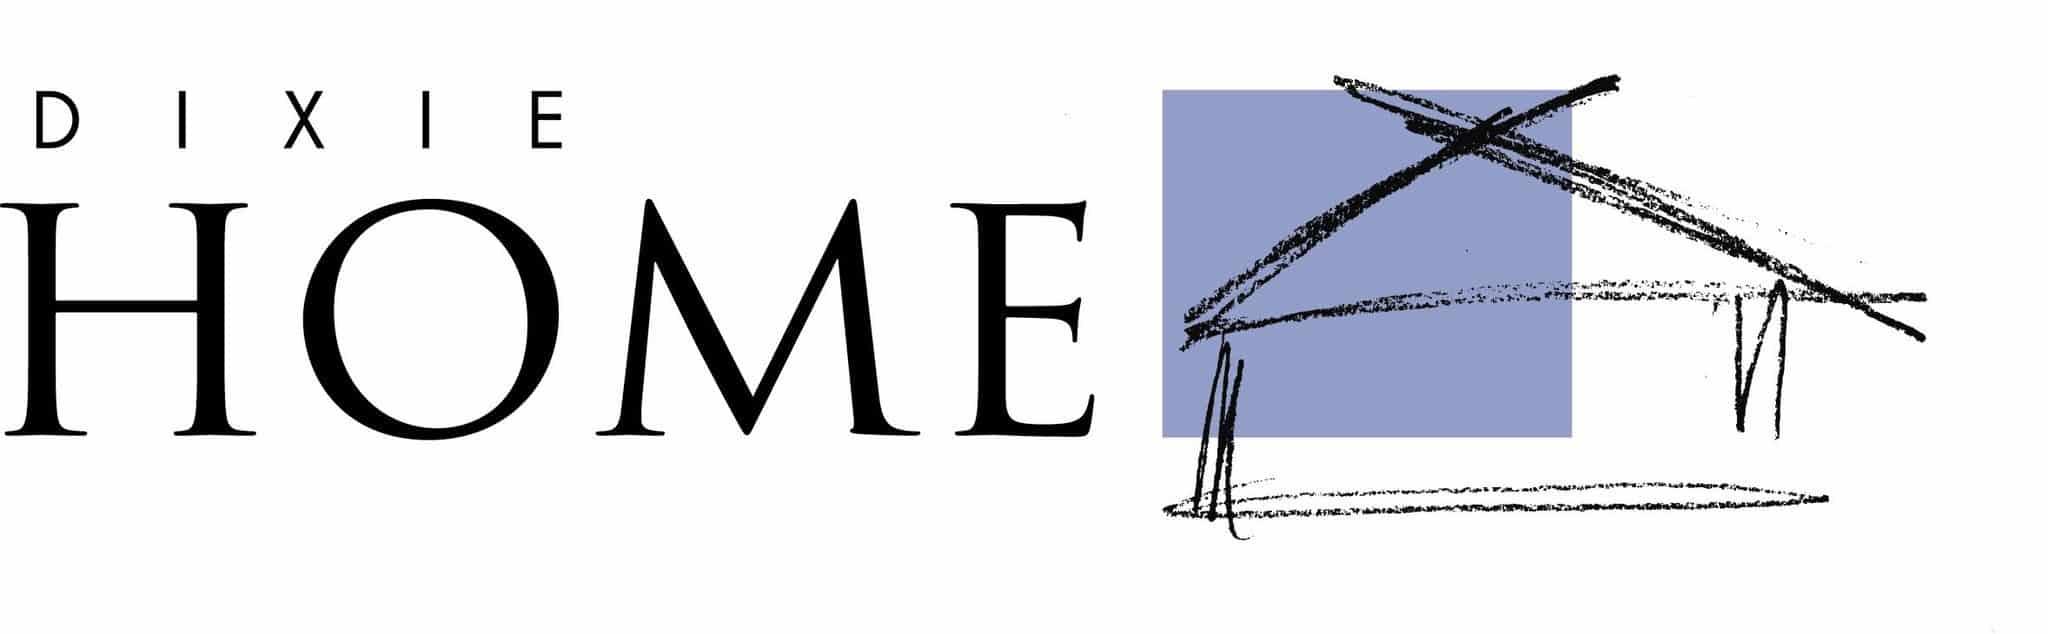 Dixie Home Flooring Logo